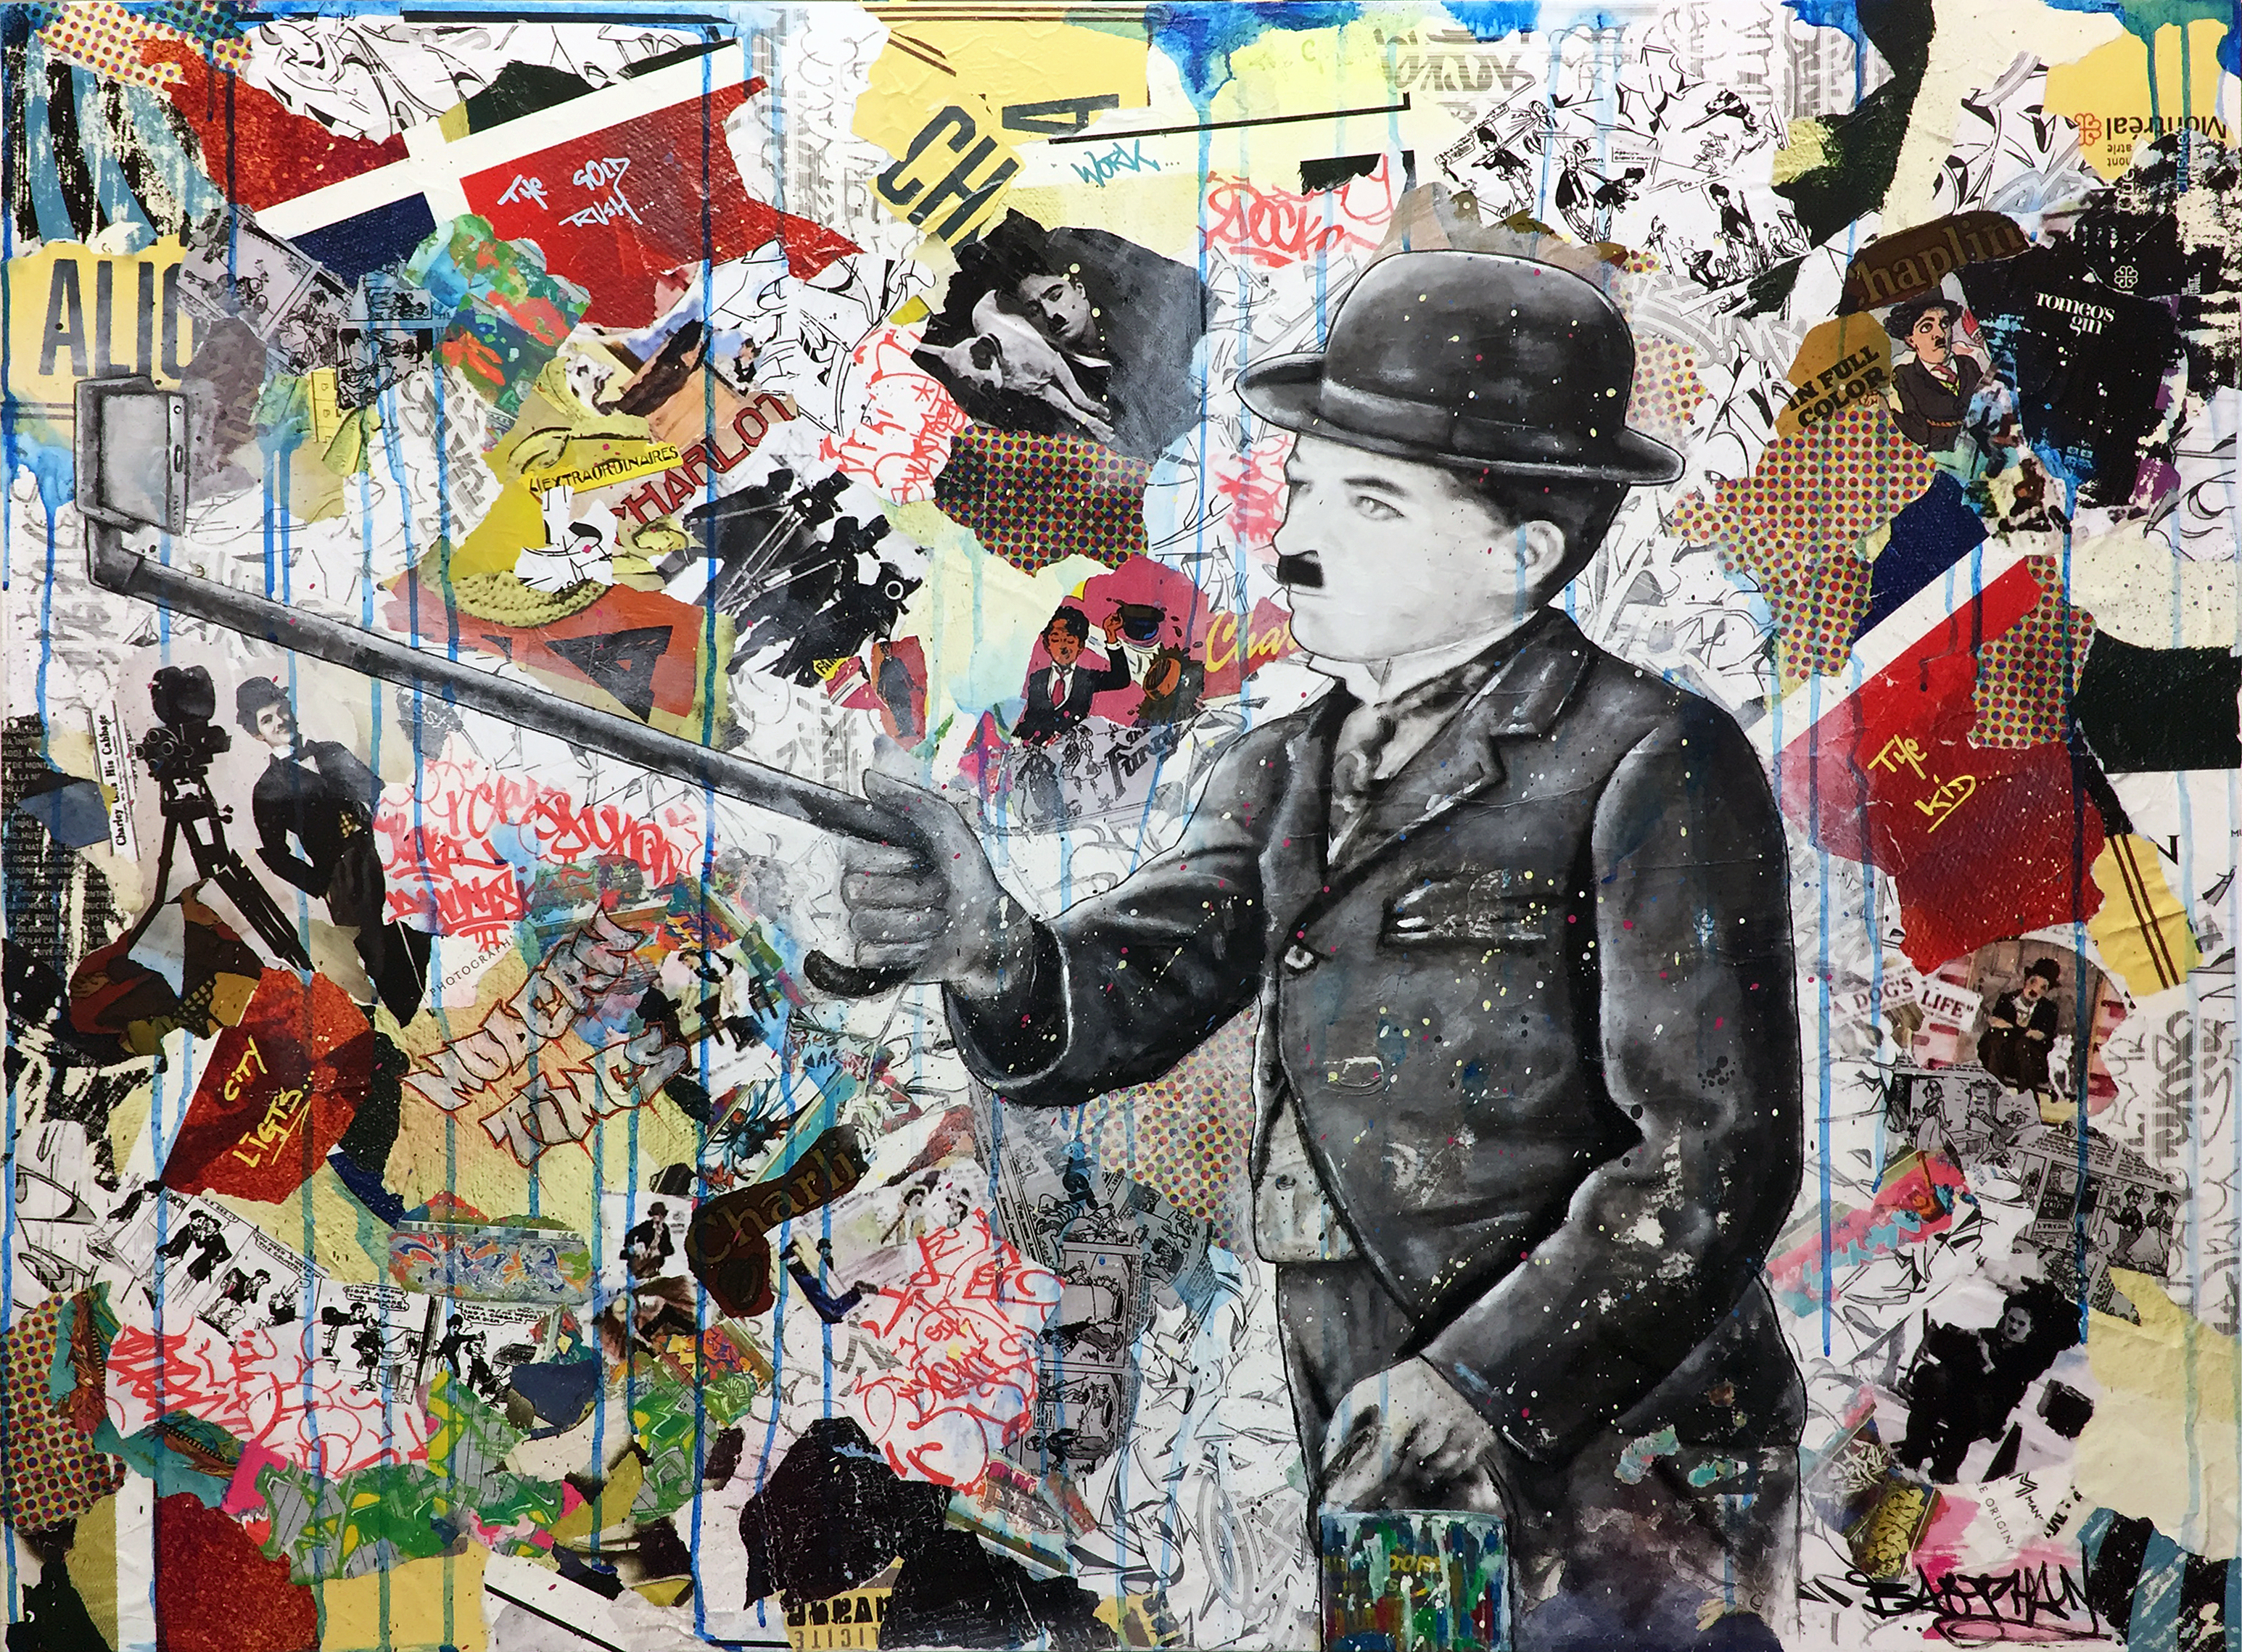 Chaplin-Modern Times Revisited